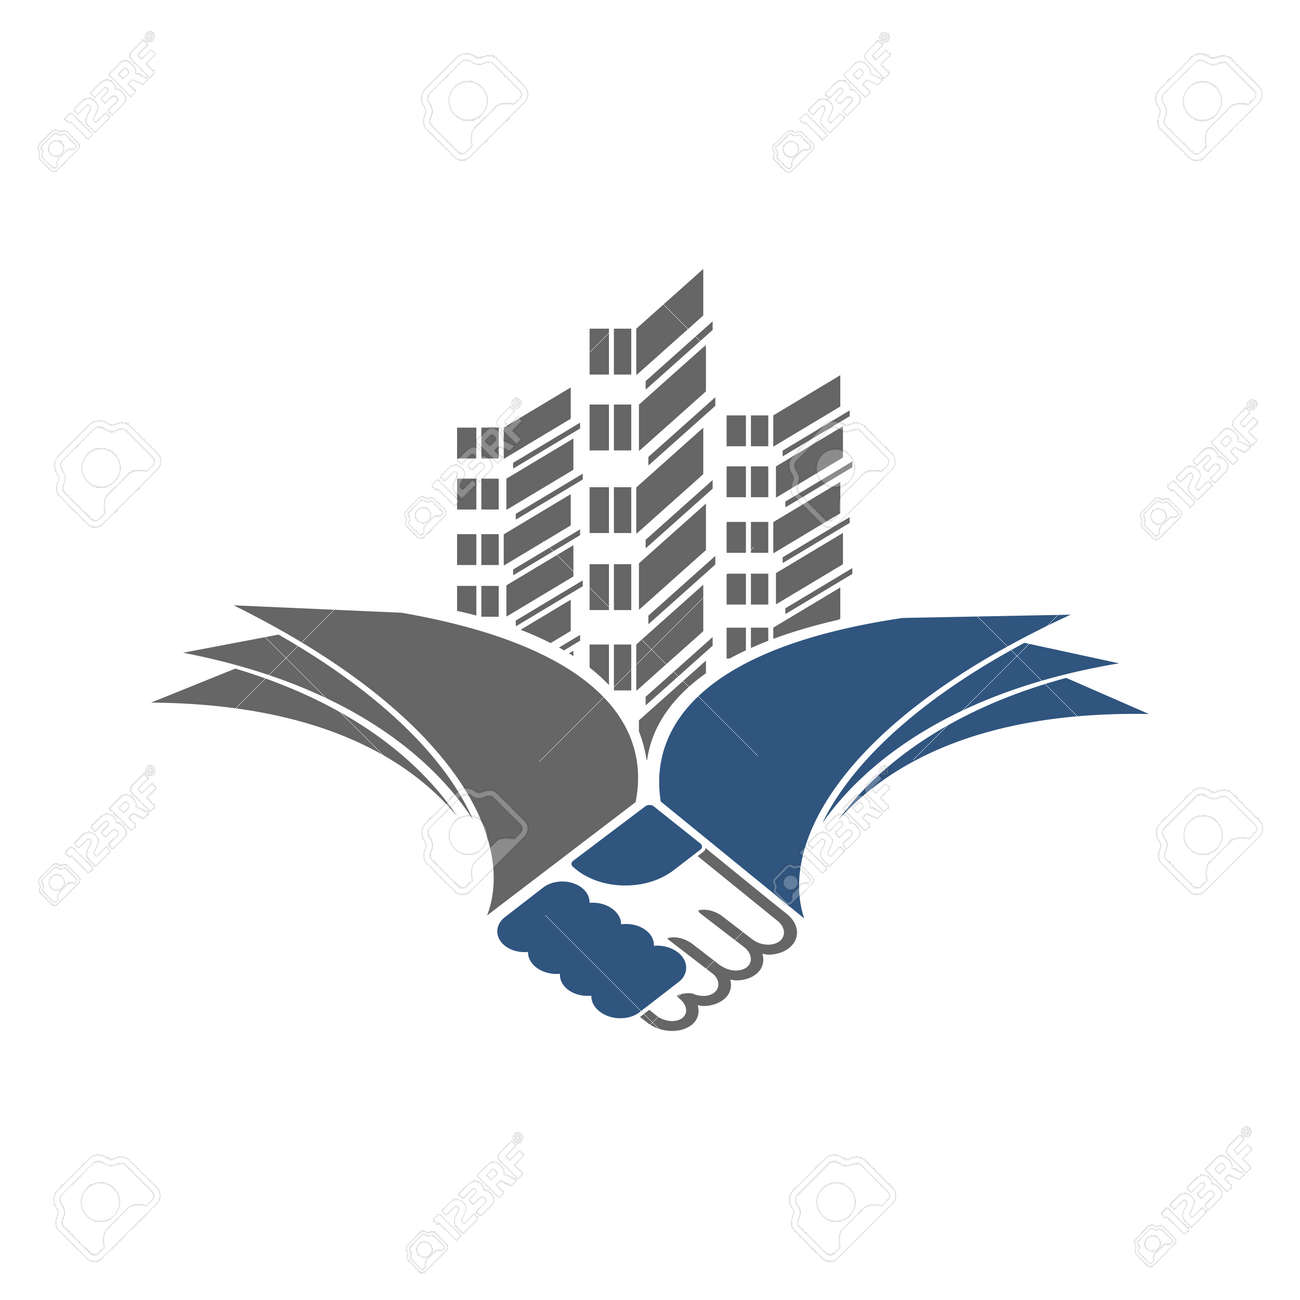 Building Logo Design Real Estate Company Logo Design Abstract Construction Logo Design Building Logo Design Clip Art Libres De Droits Vecteurs Et Illustration Image 110511732,Simple Horse Embroidery Design